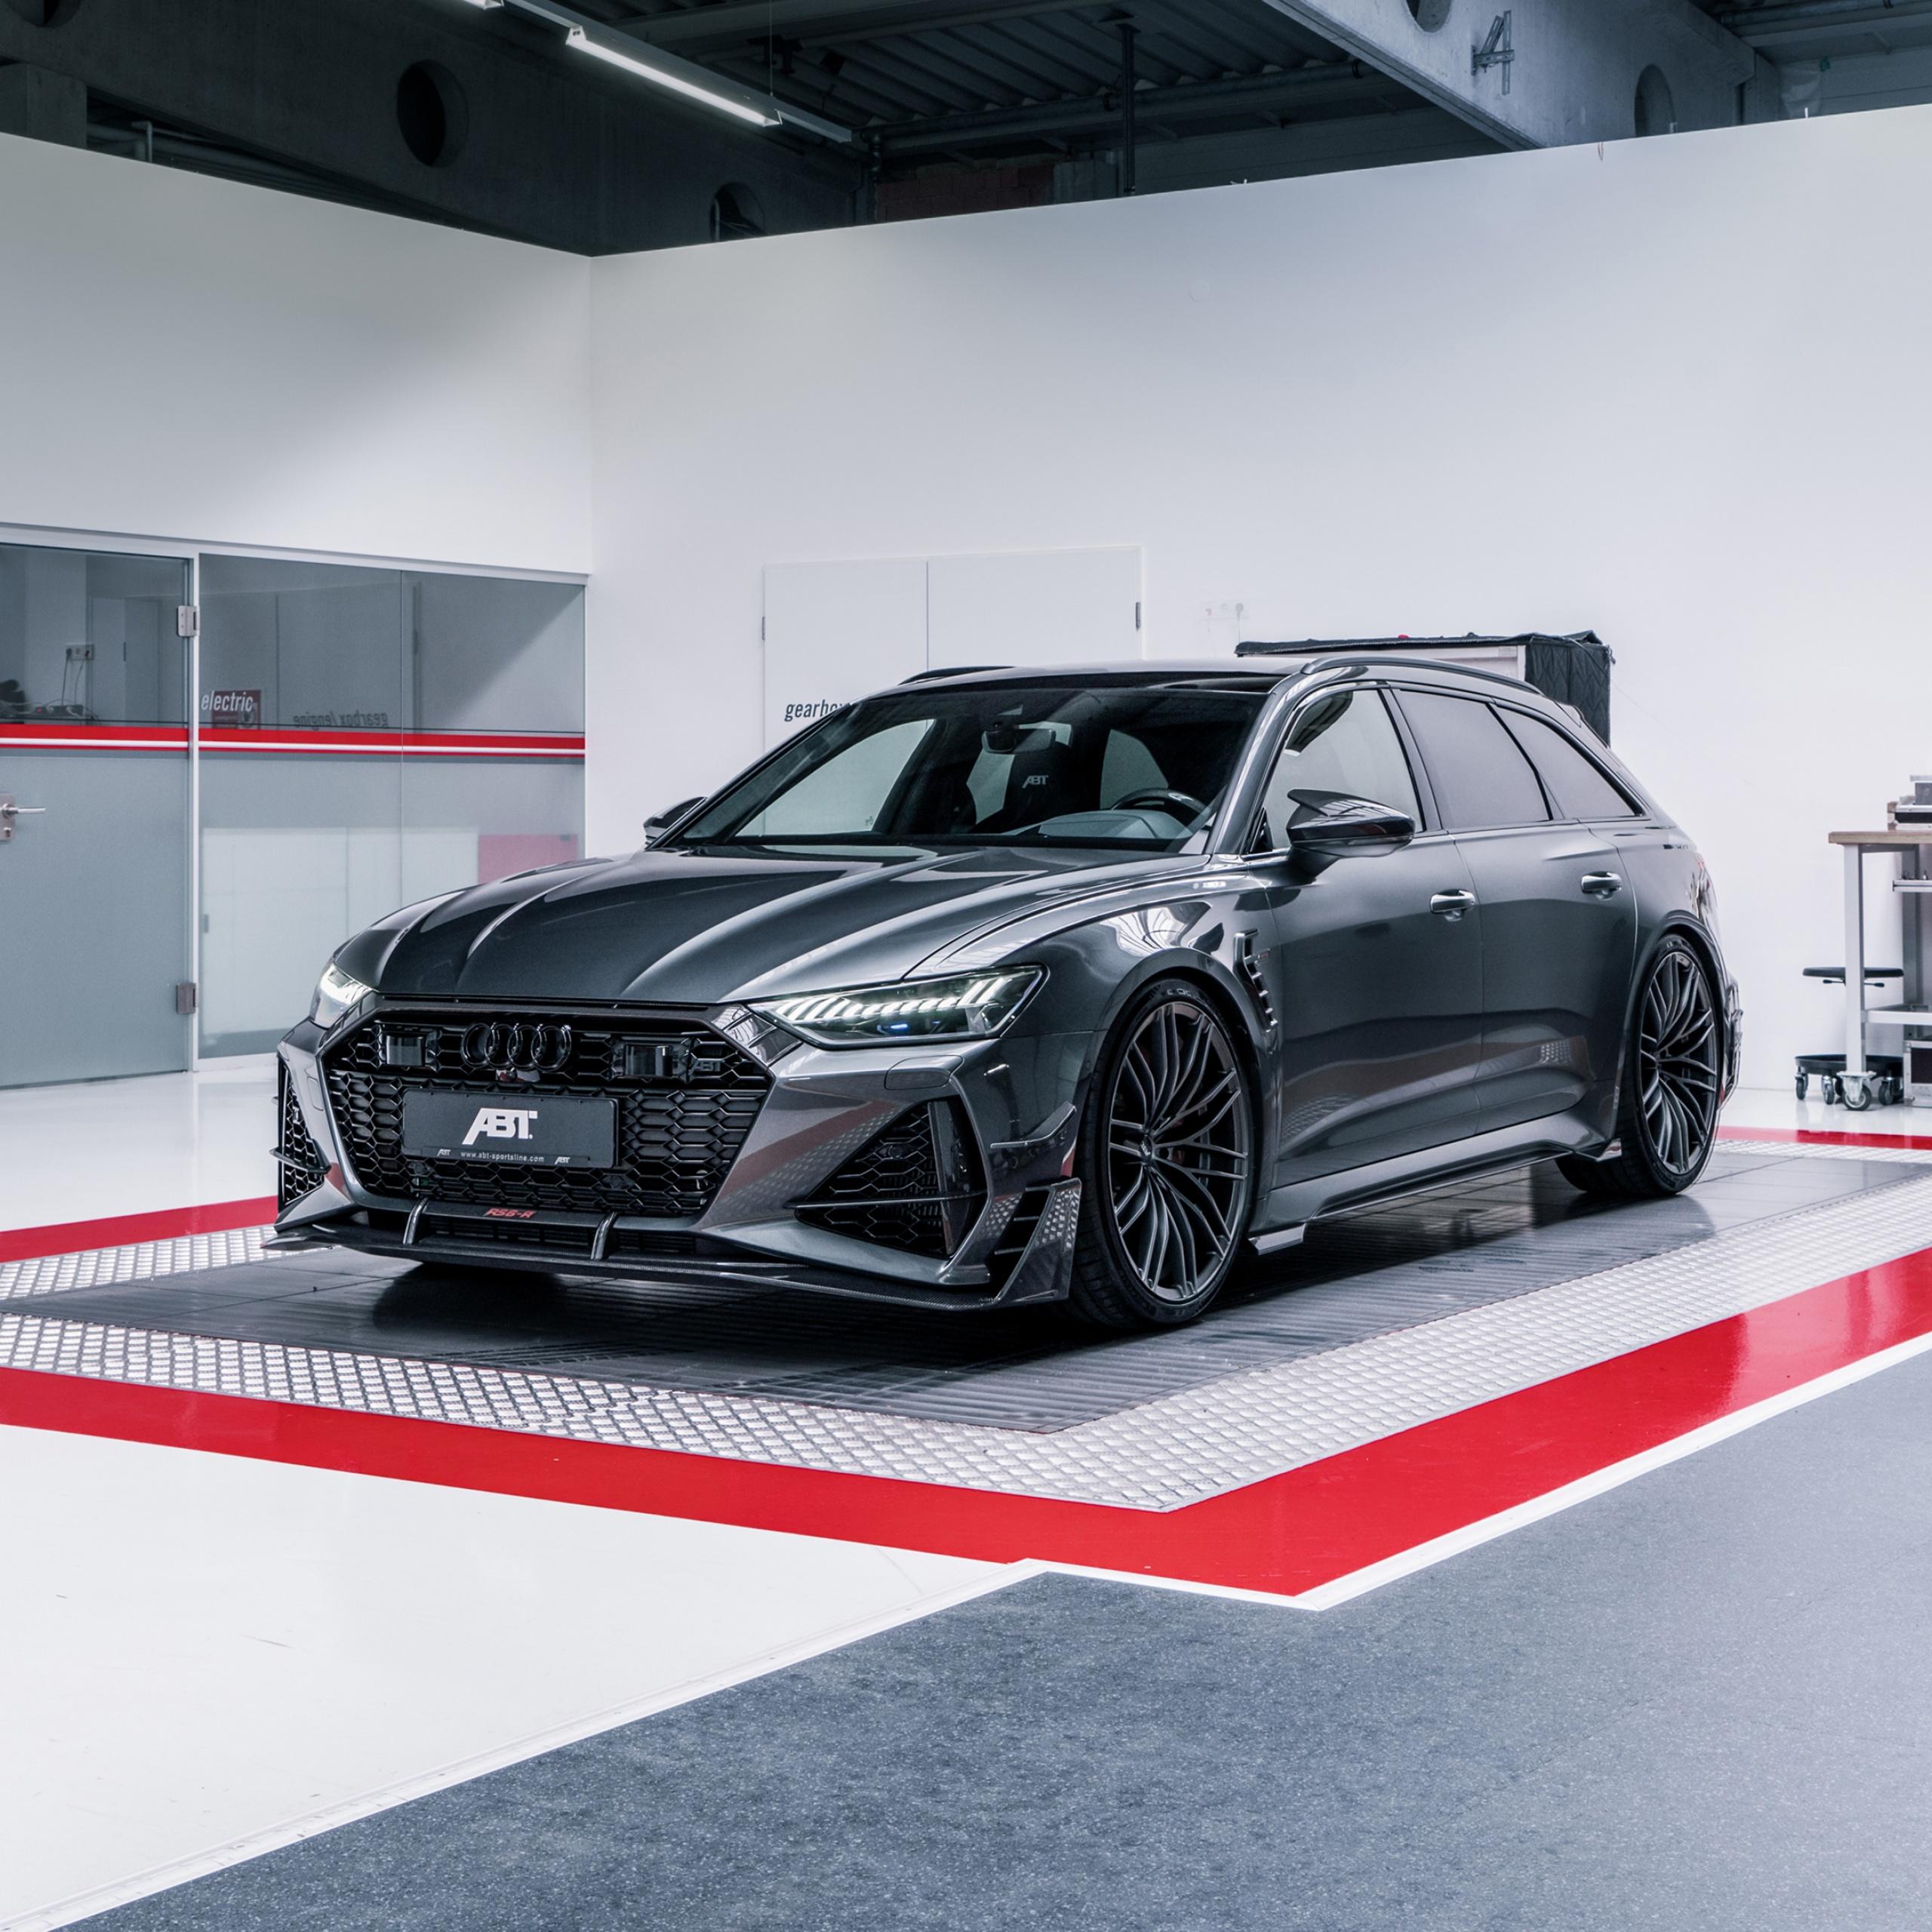 4K Wallpaper ABT Audi RS6-R, 2020, Cars, #223